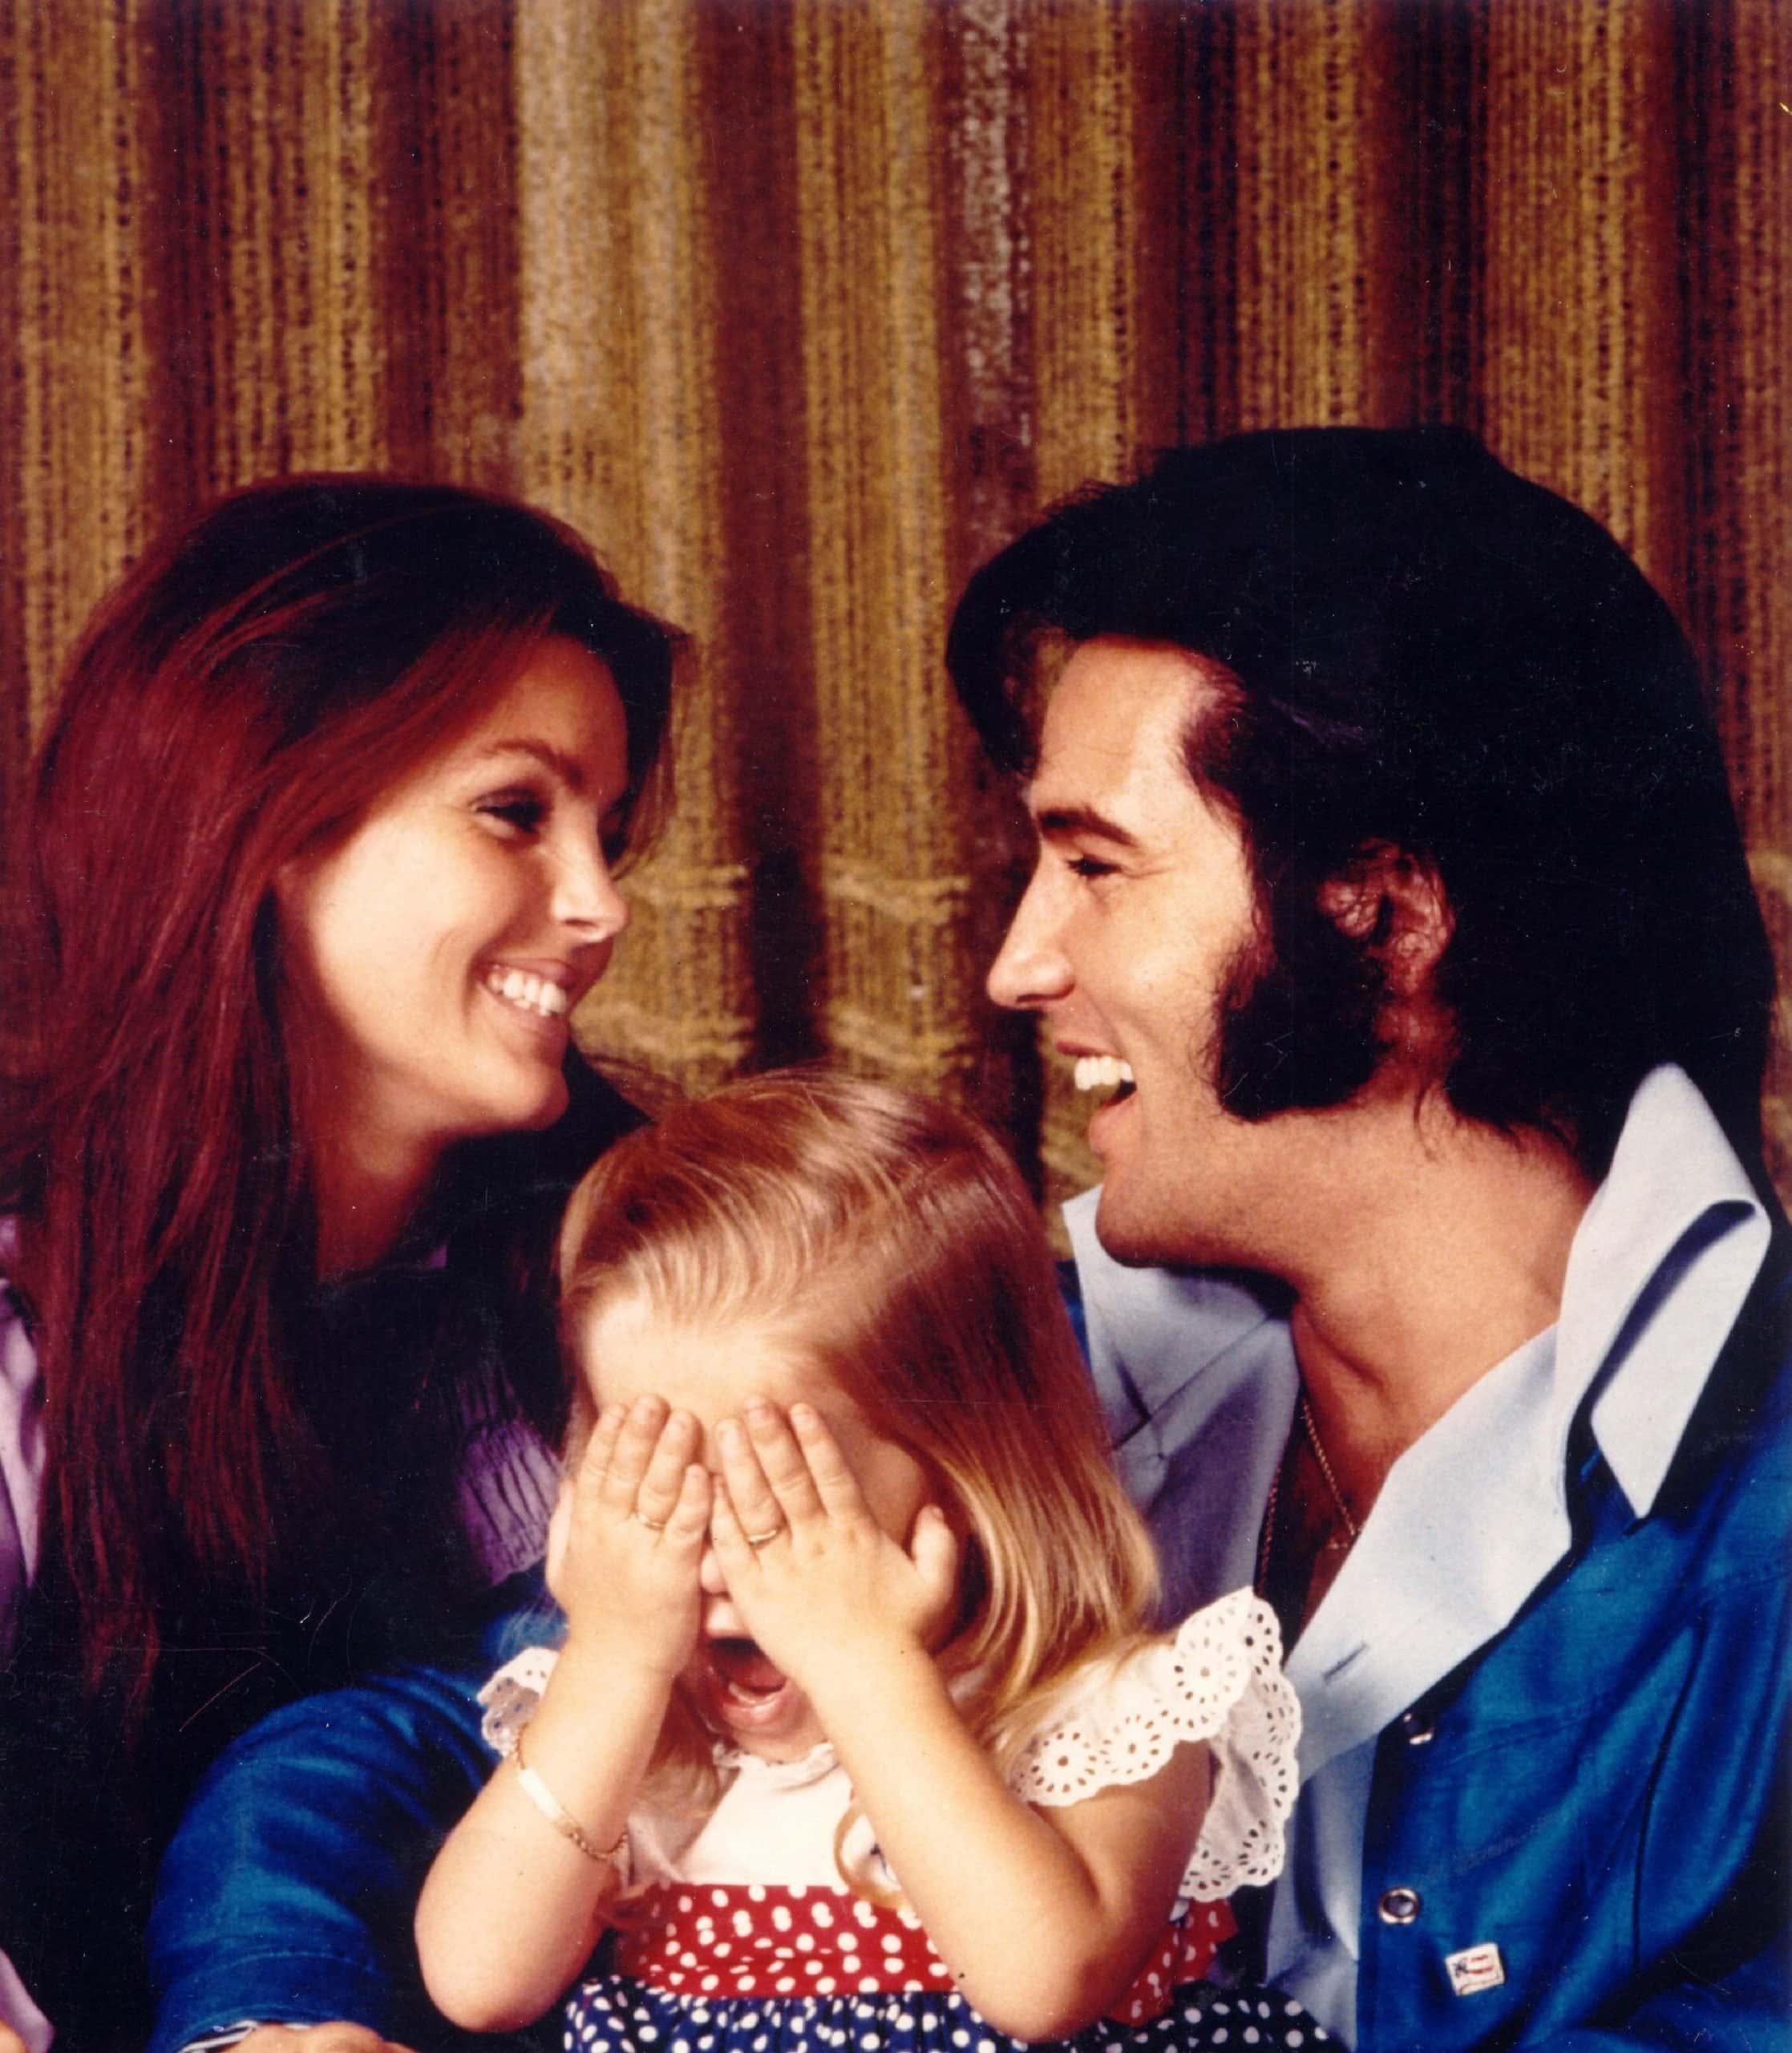 Elvis Presley, Priscilla Presley, and their daughter Lisa Marie Presley in 1971